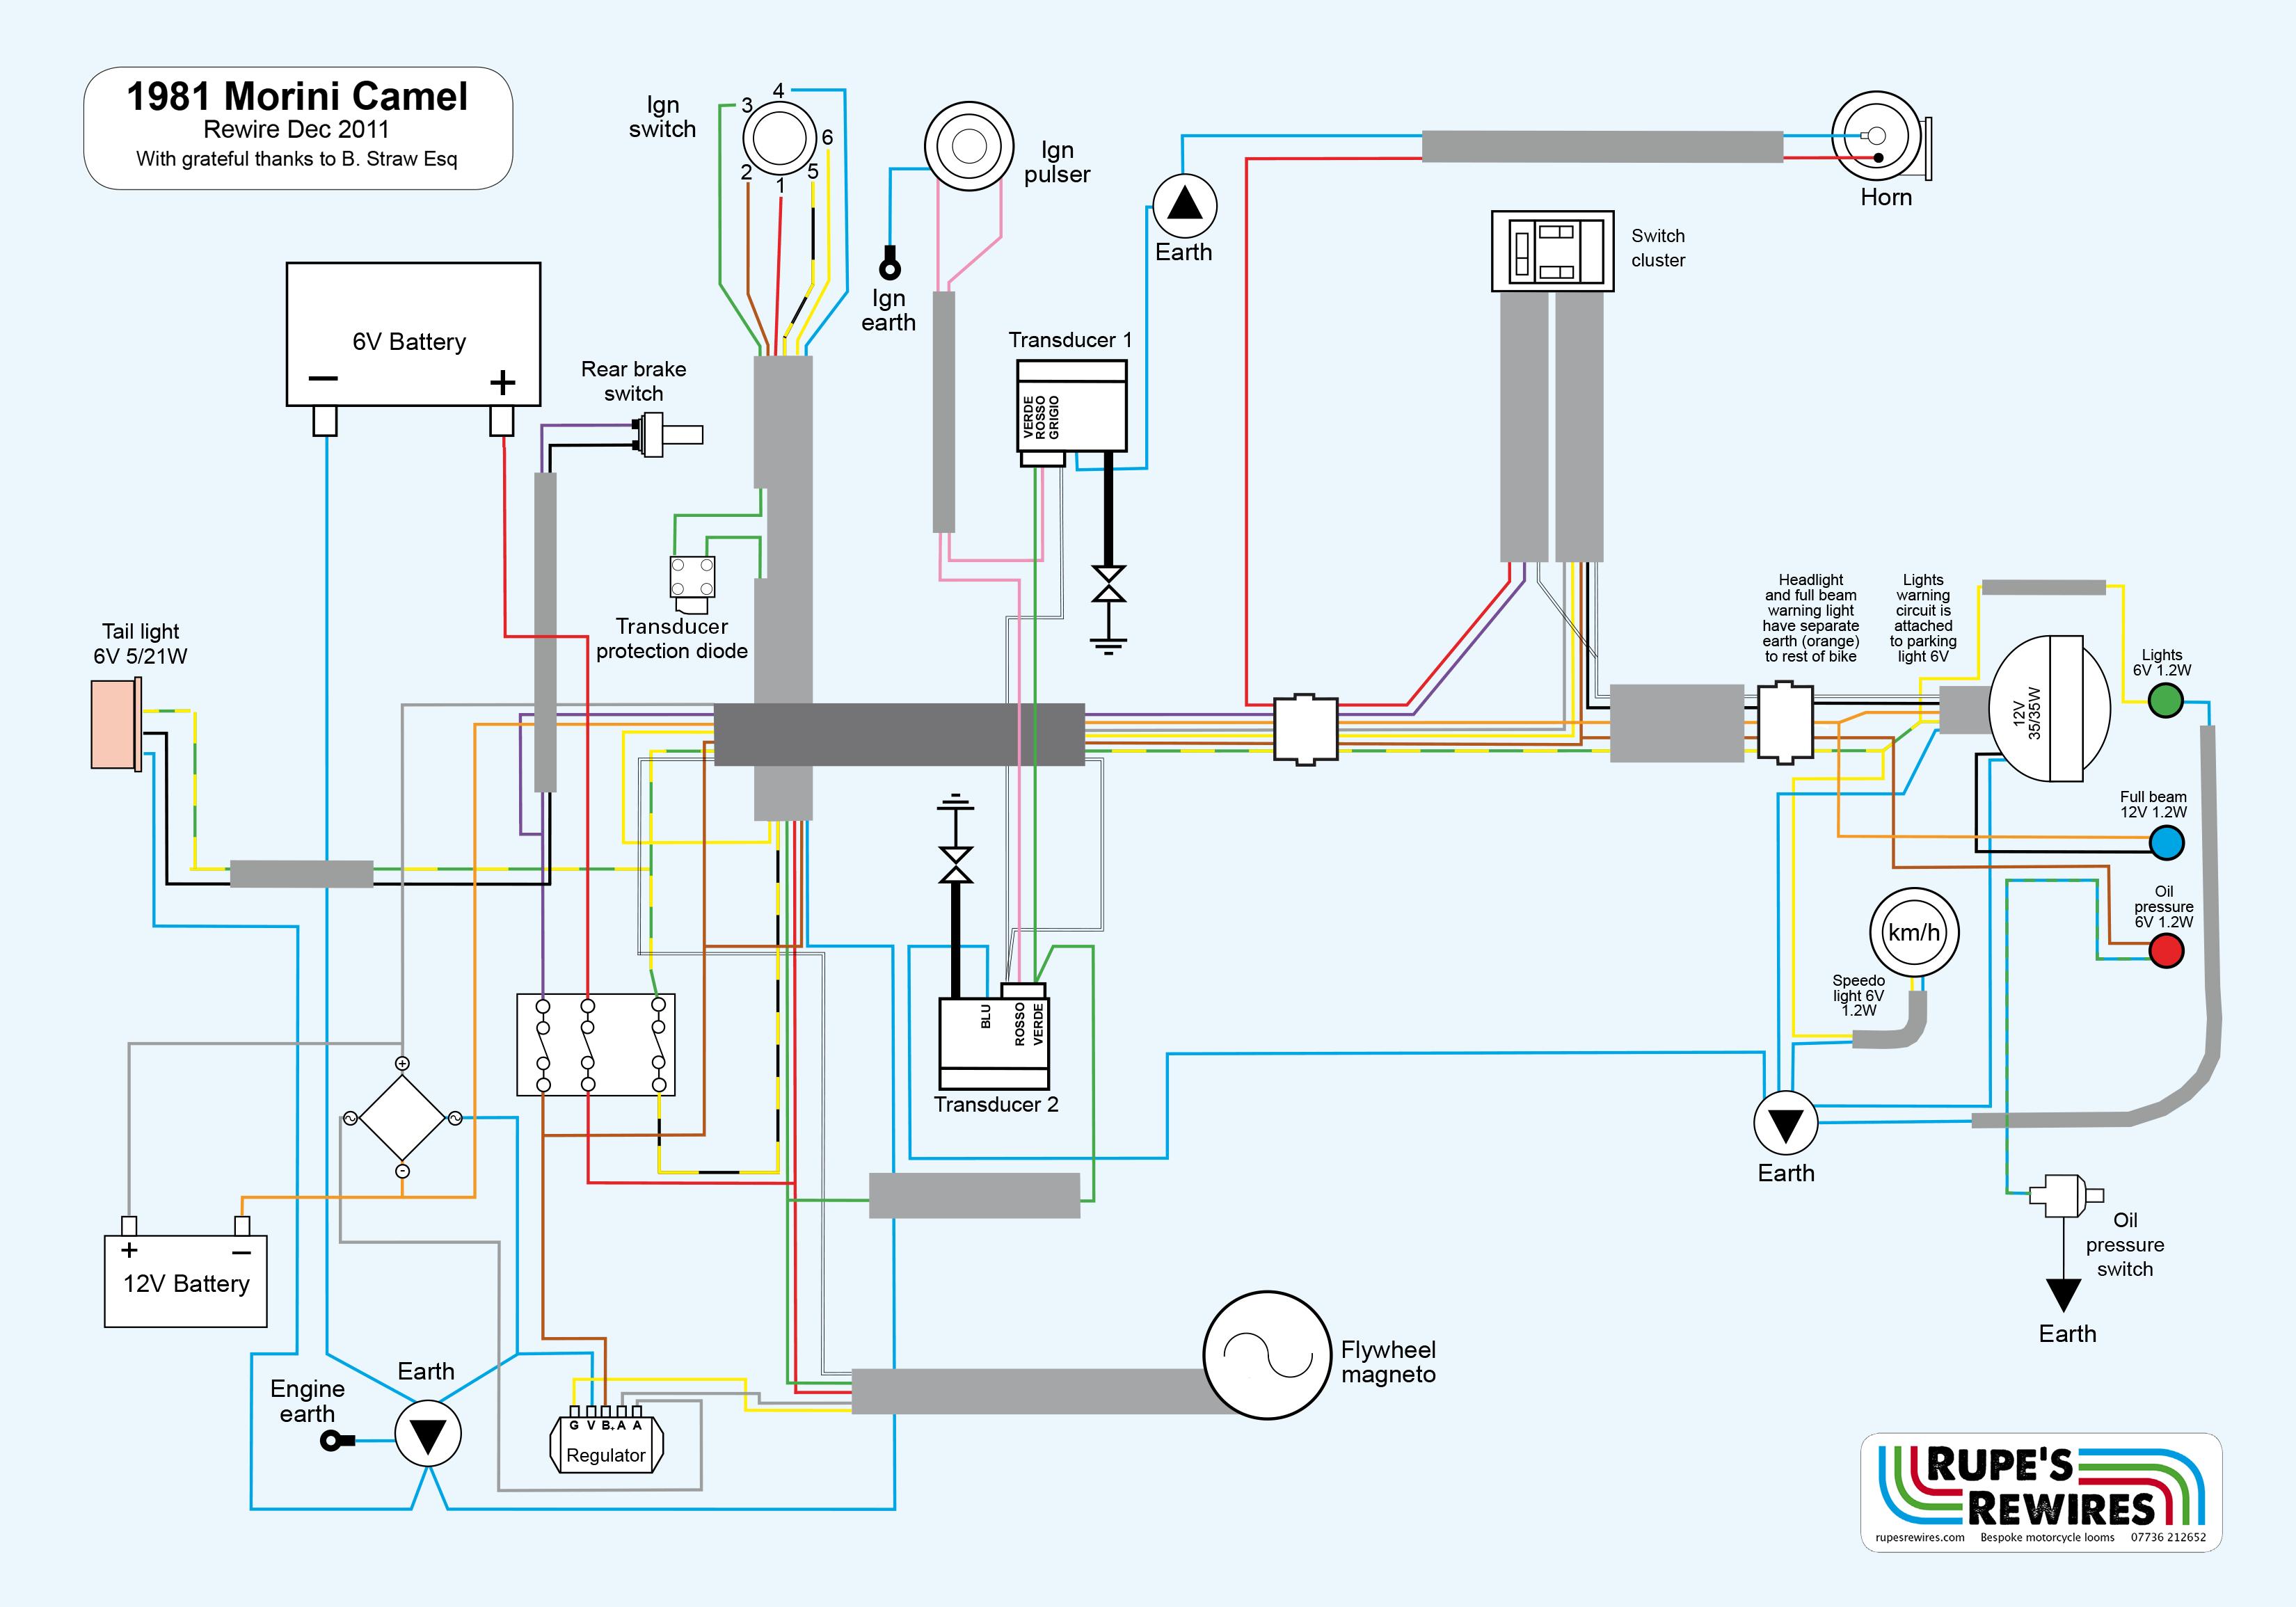 morini camel wiring diagram full size image